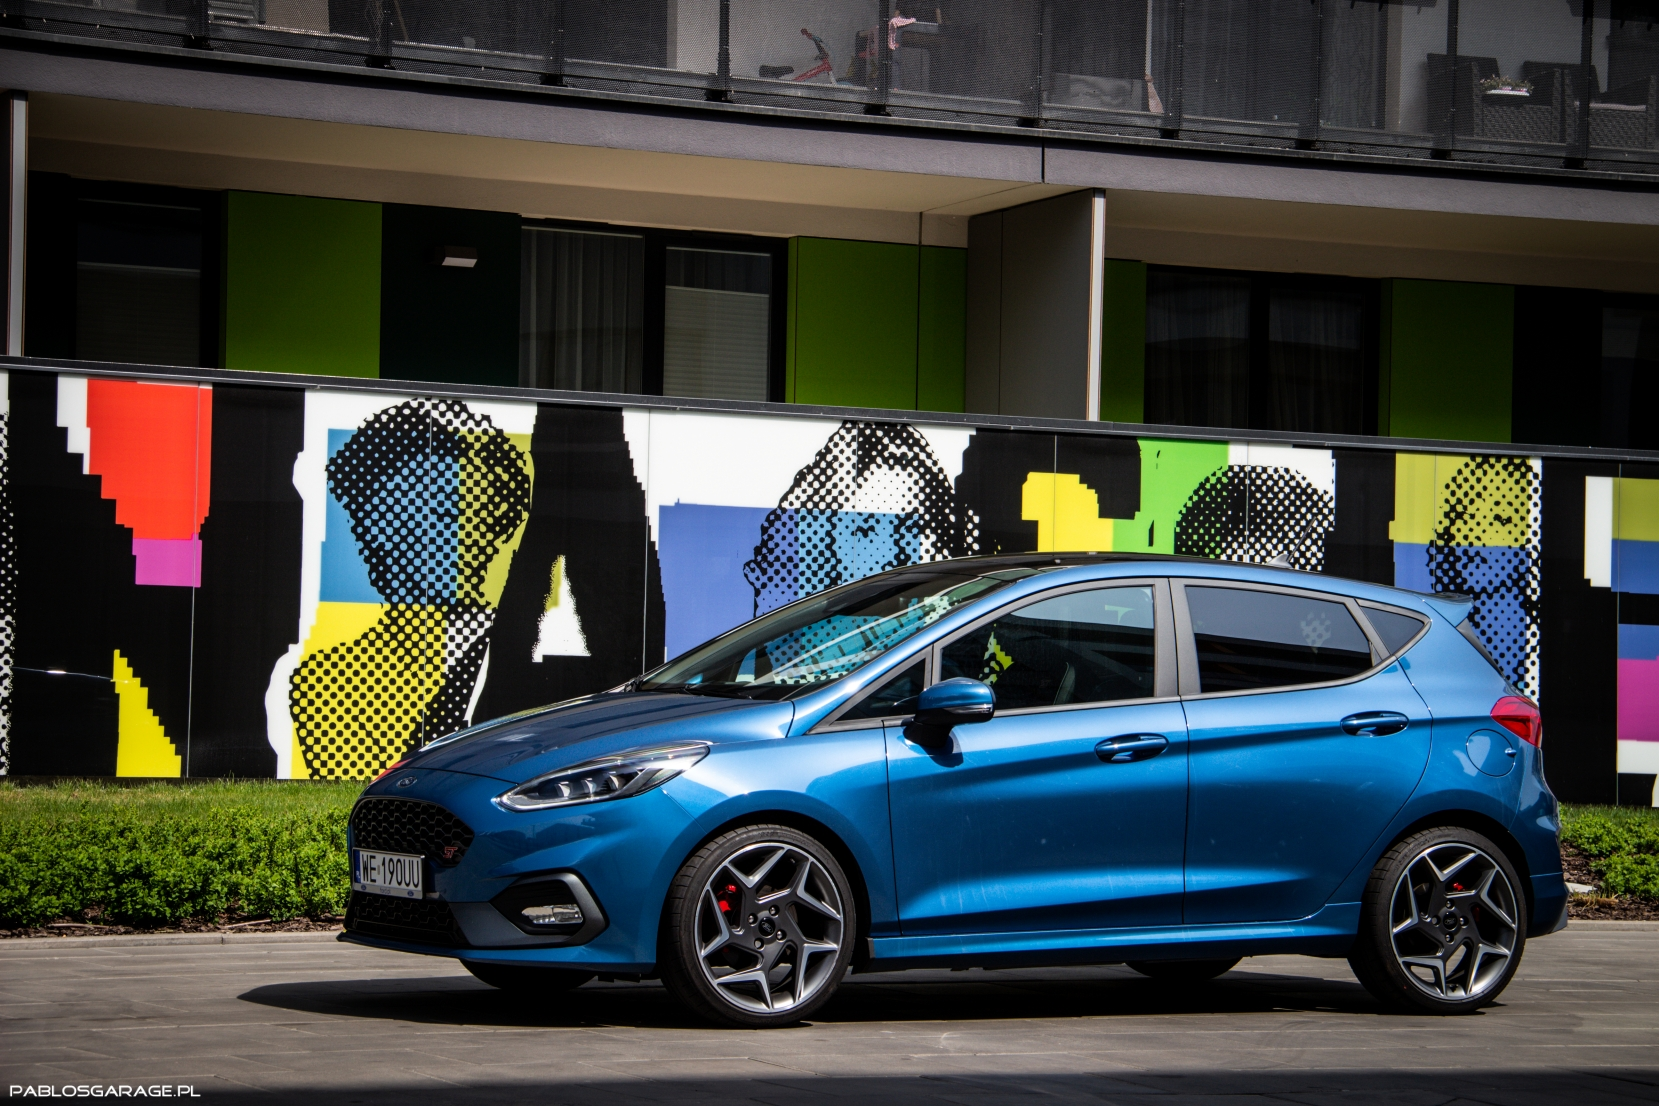 2019 Ford Fiesta ST 1.5 EcoBoost 200 KM